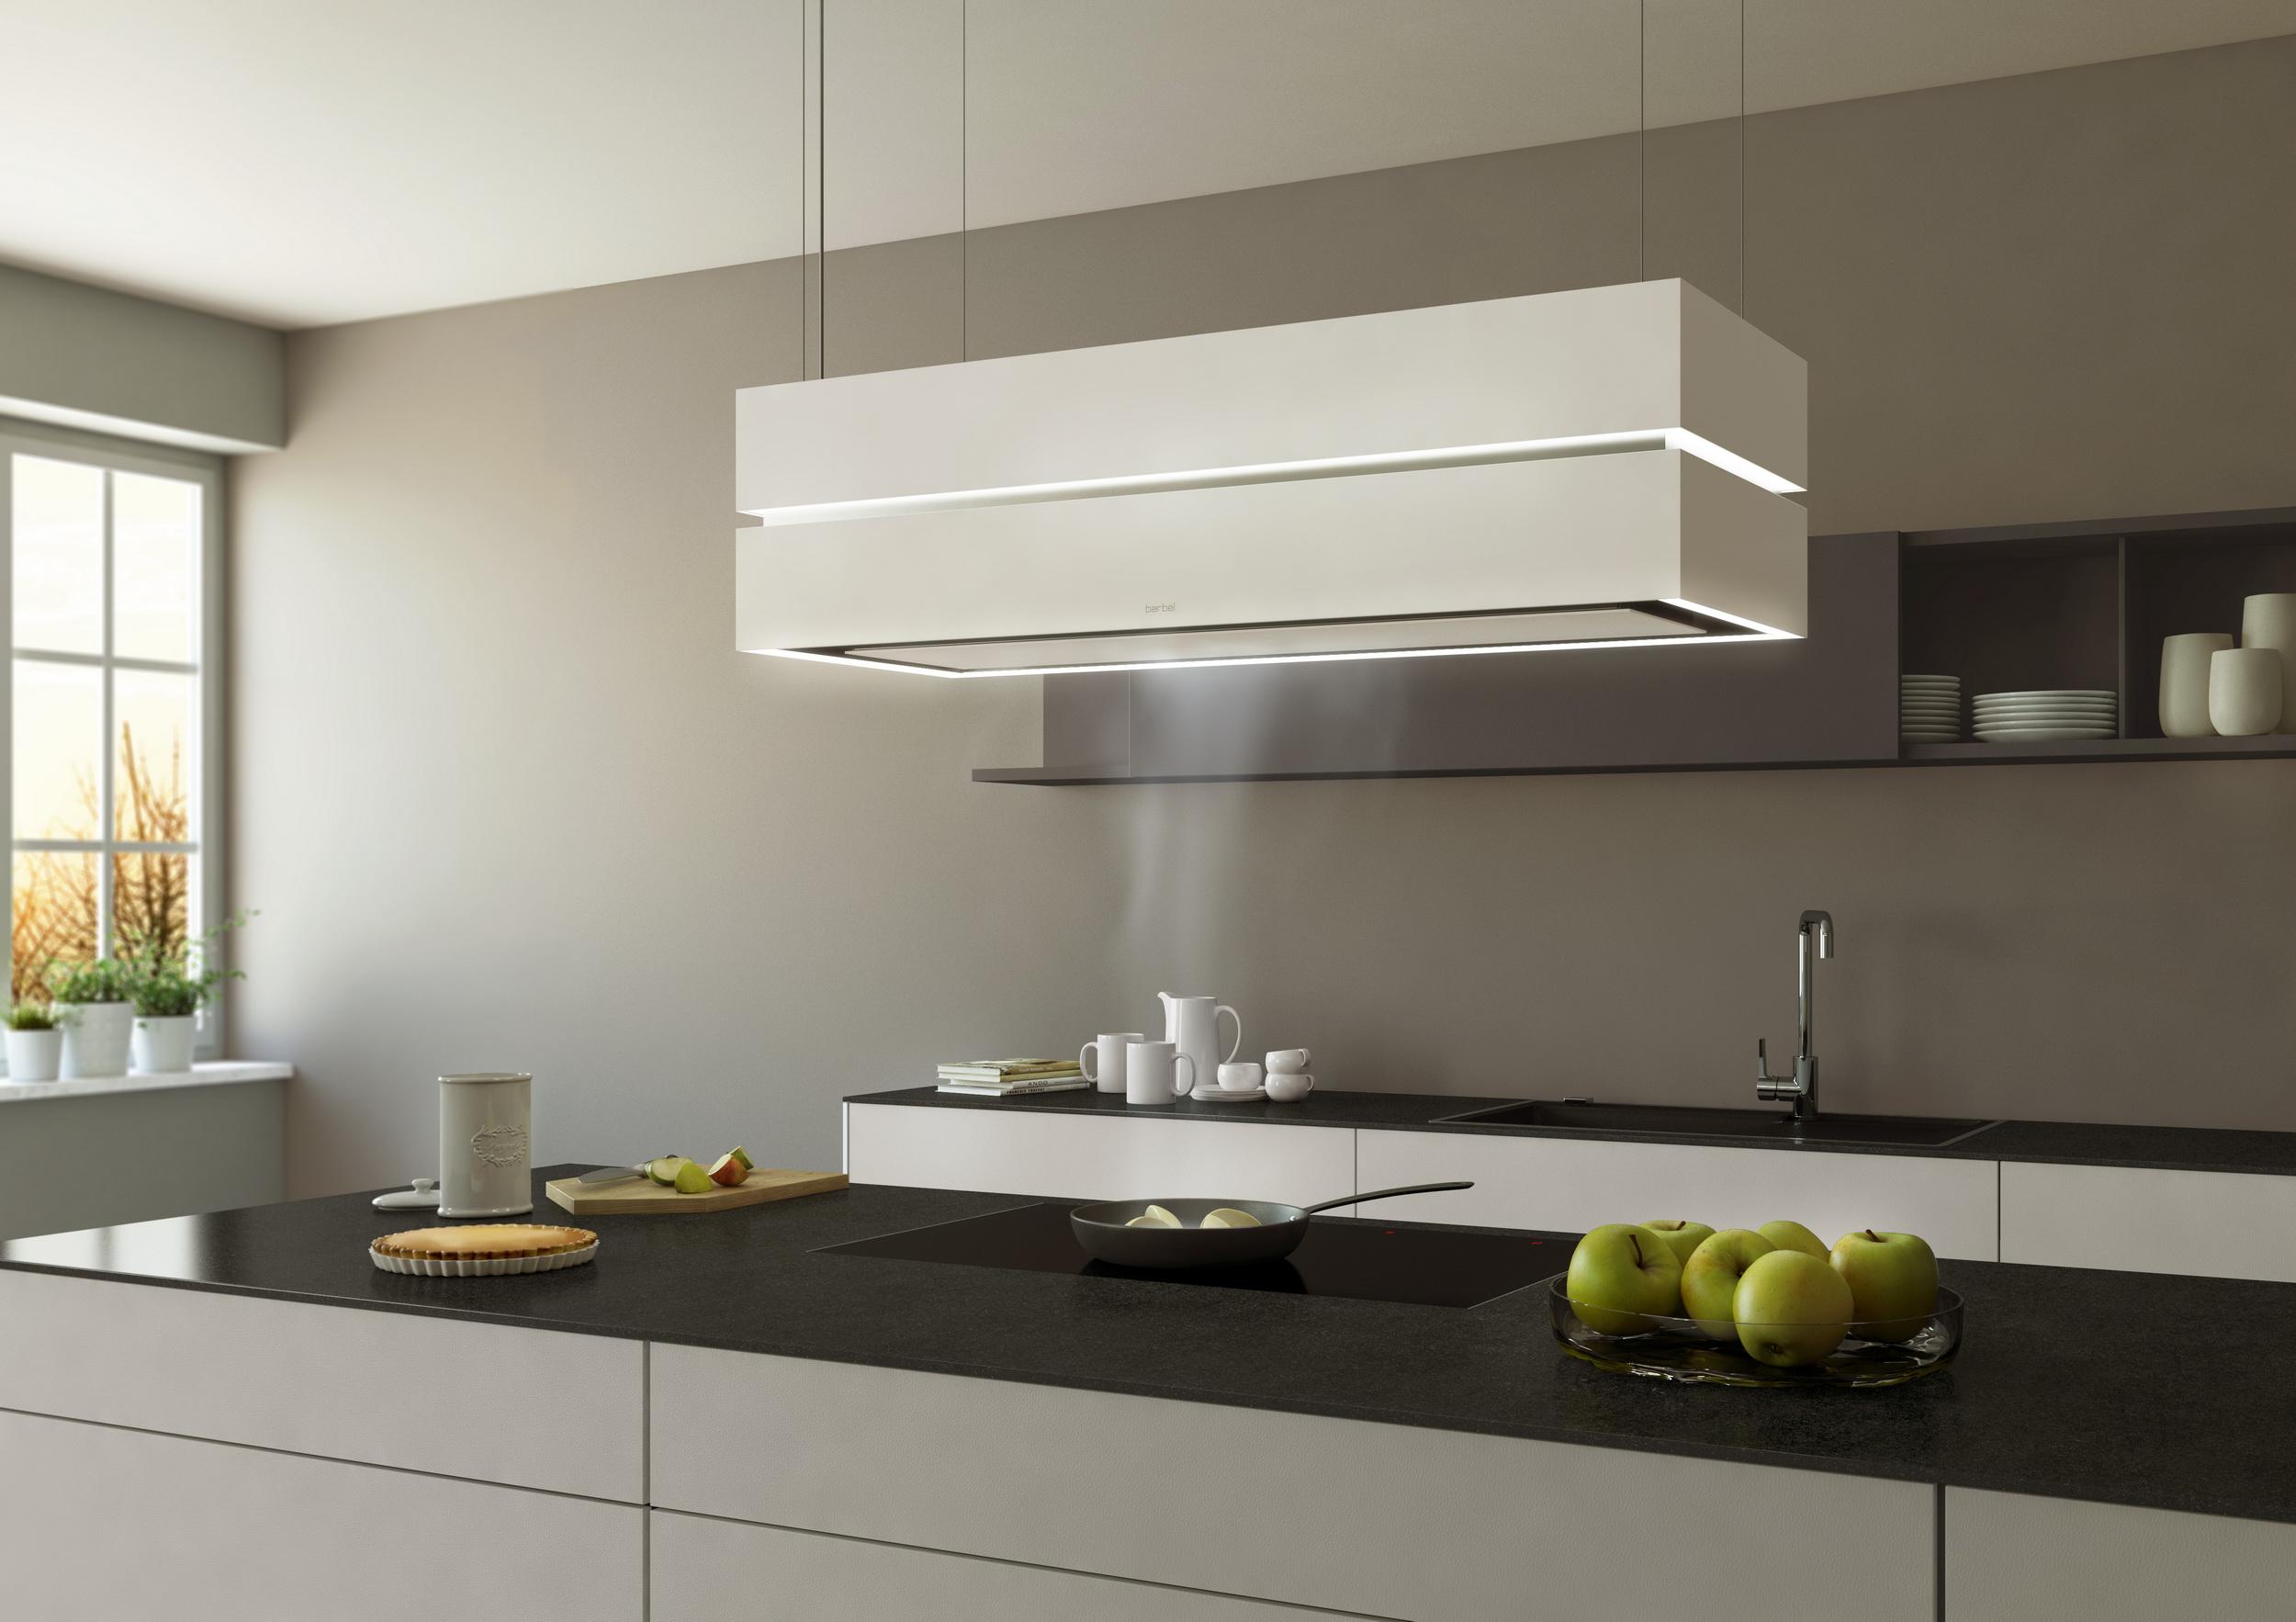 berbel deckenlifthaube skyline edge. Black Bedroom Furniture Sets. Home Design Ideas